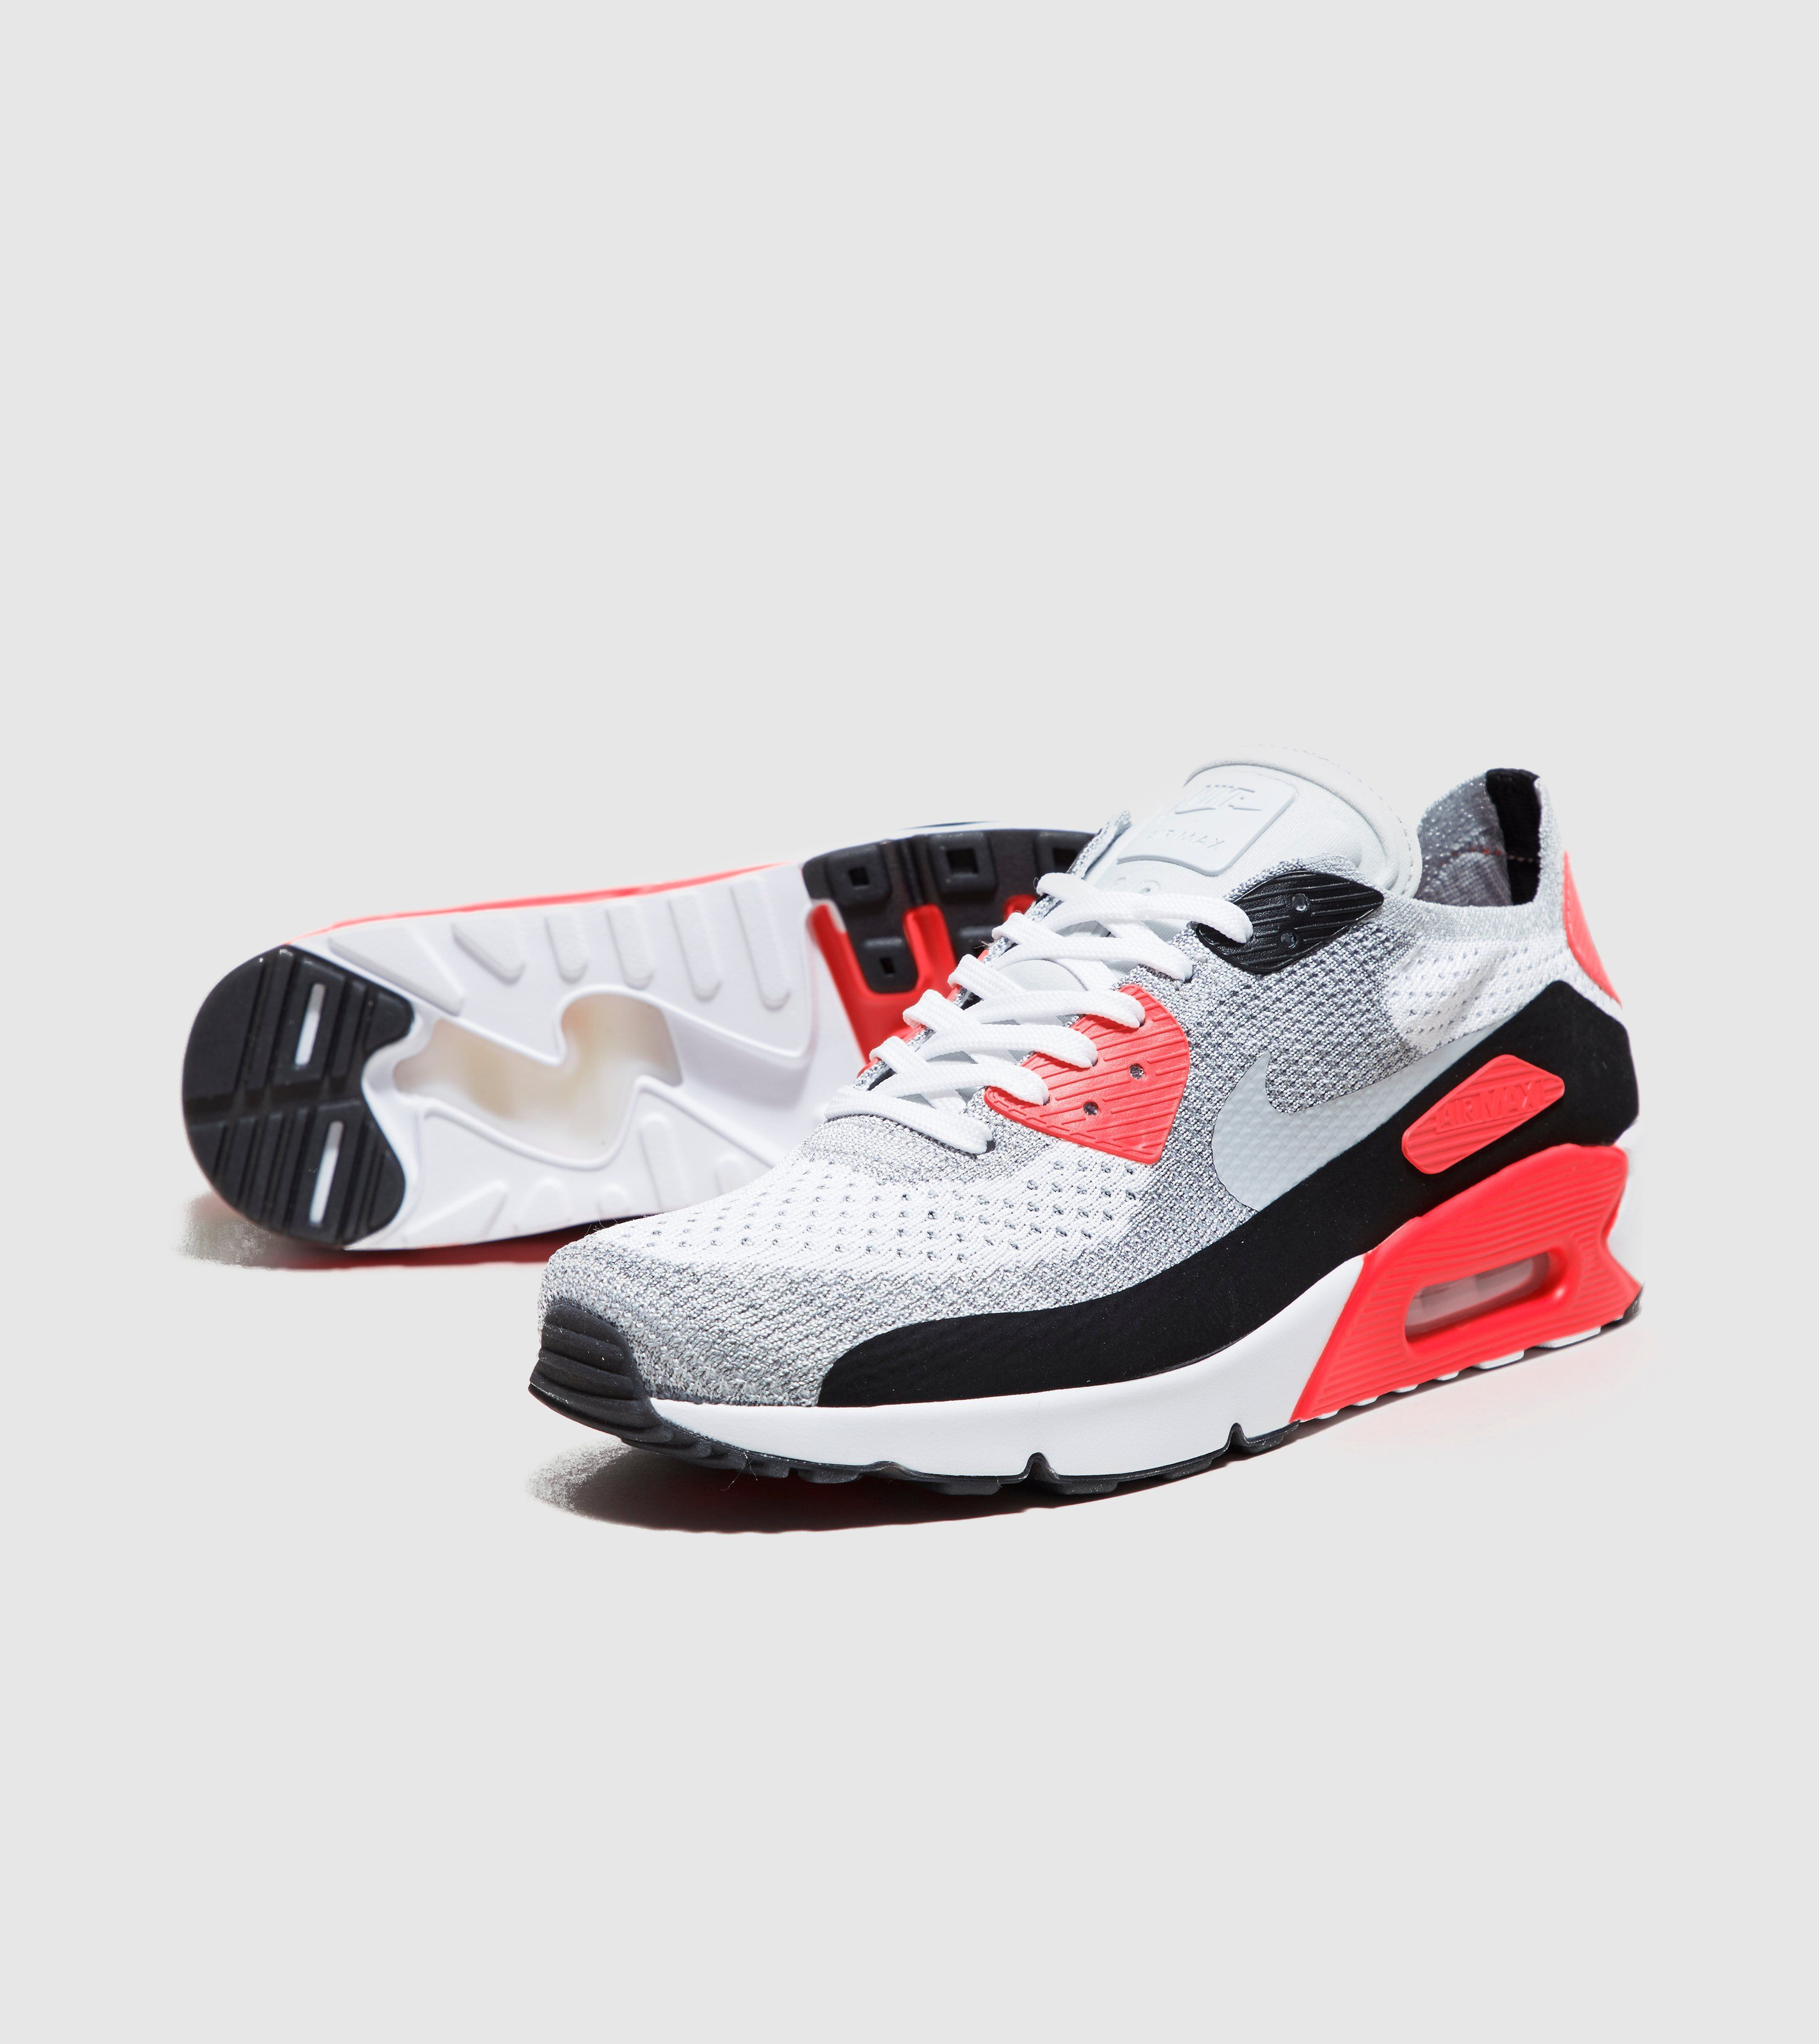 2018 8 875943 007 Nike Air Max 90 Ultra 2.0 Flyknit